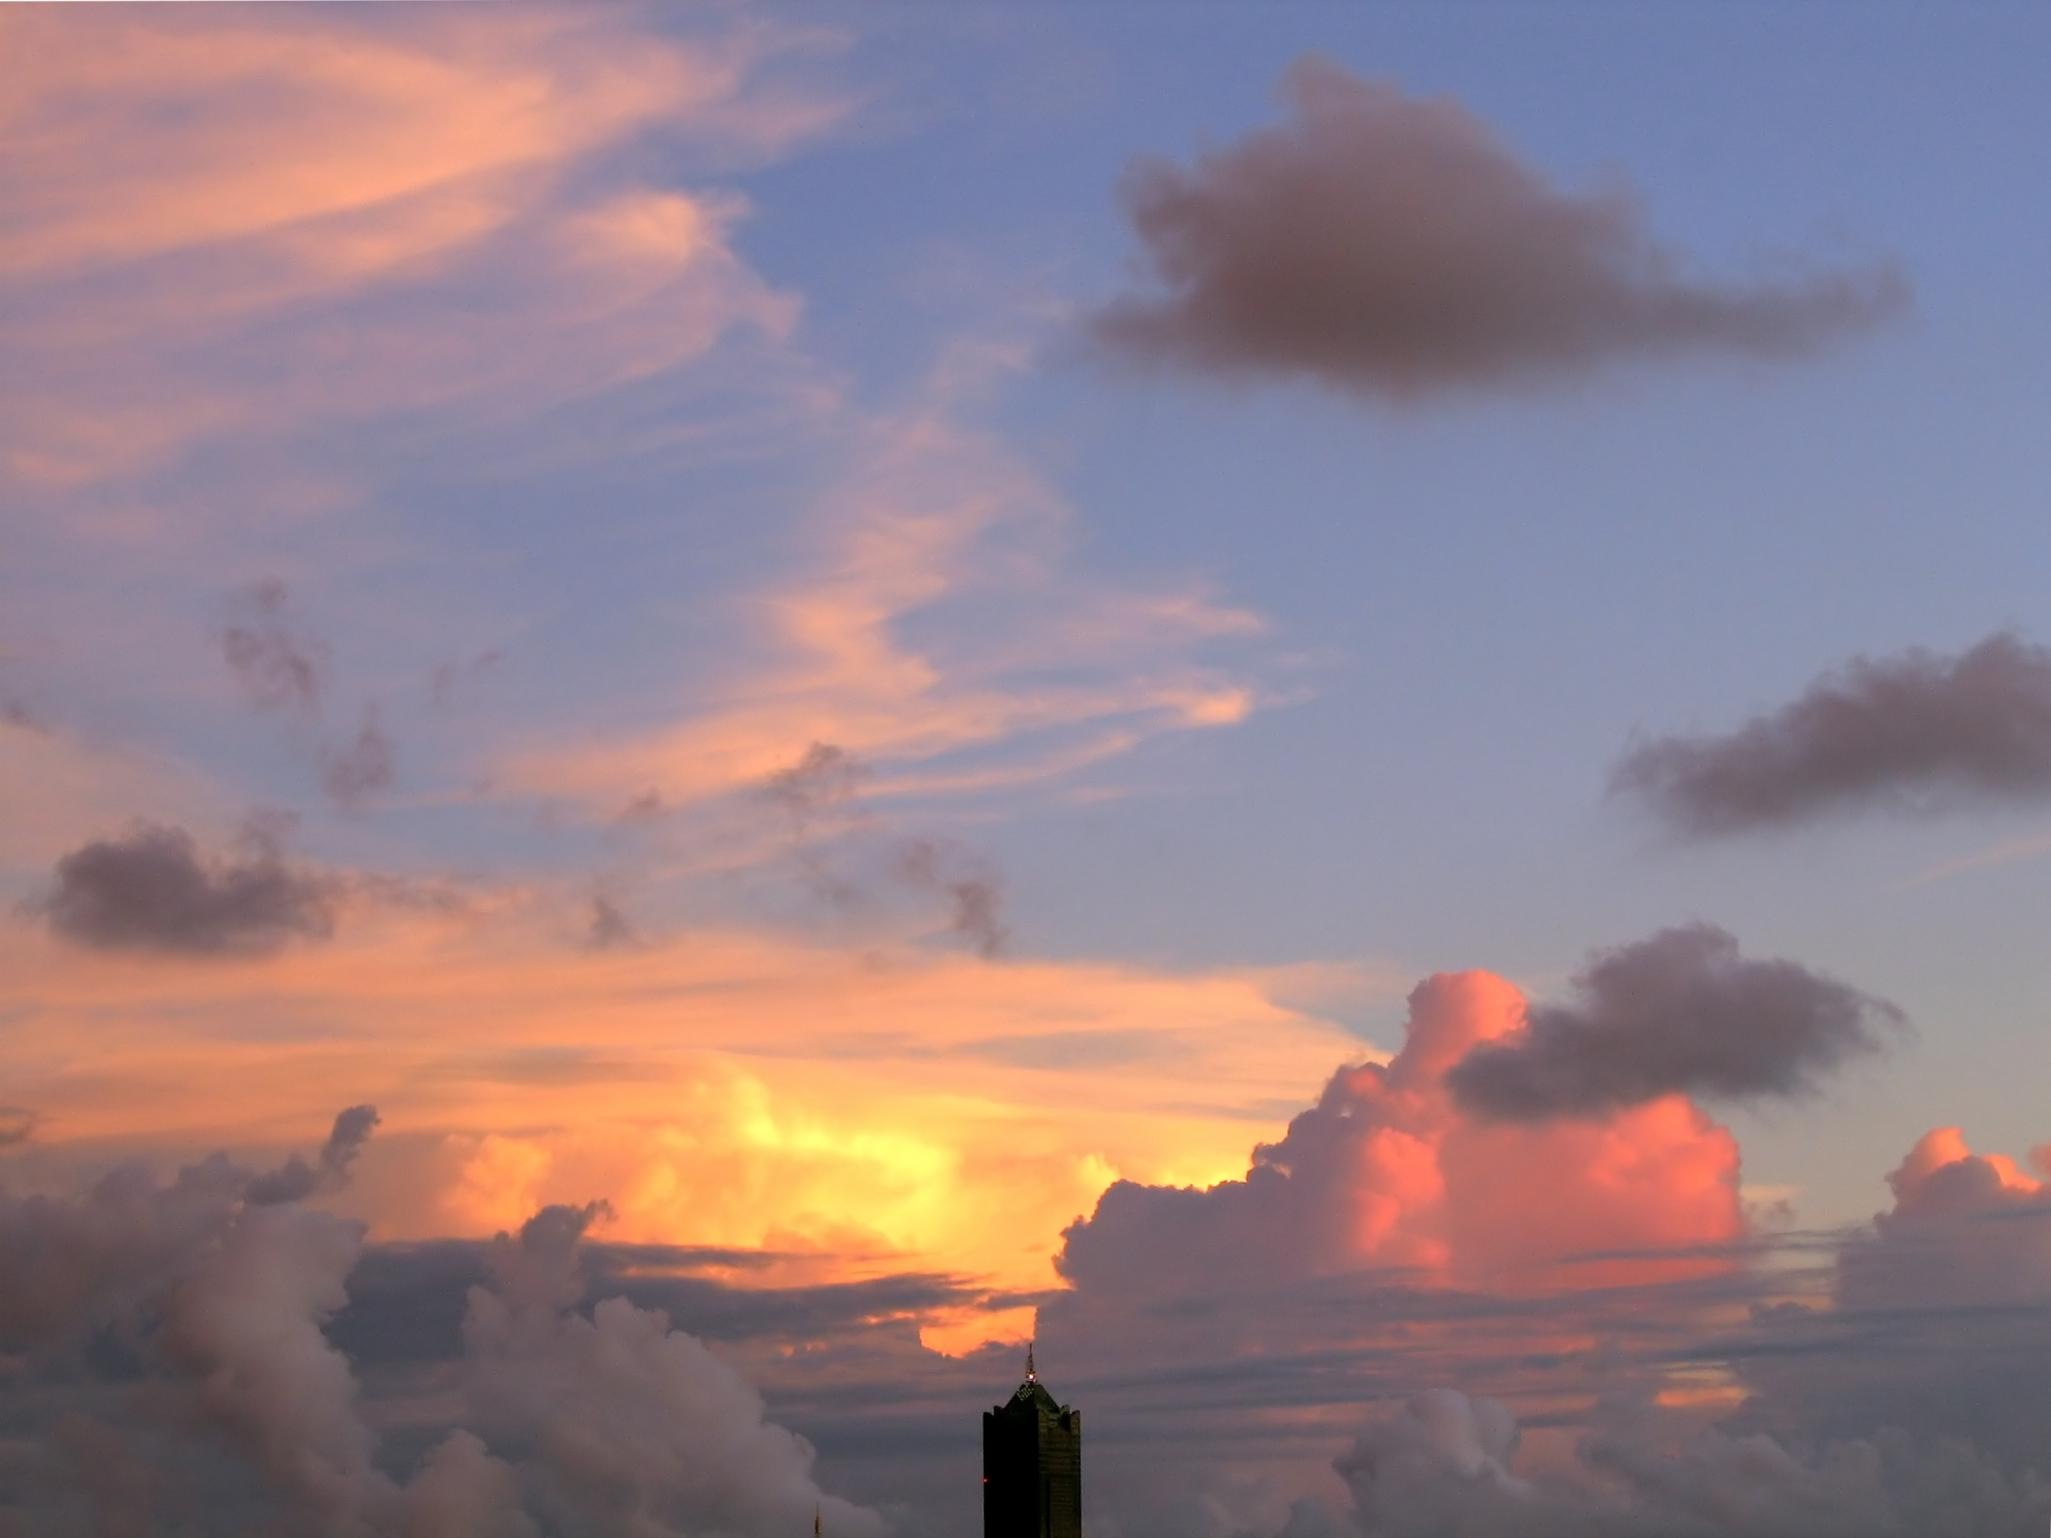 Skyscraper Top at Evening Time, Antenna, Azure, Upward, Tower, HQ Photo